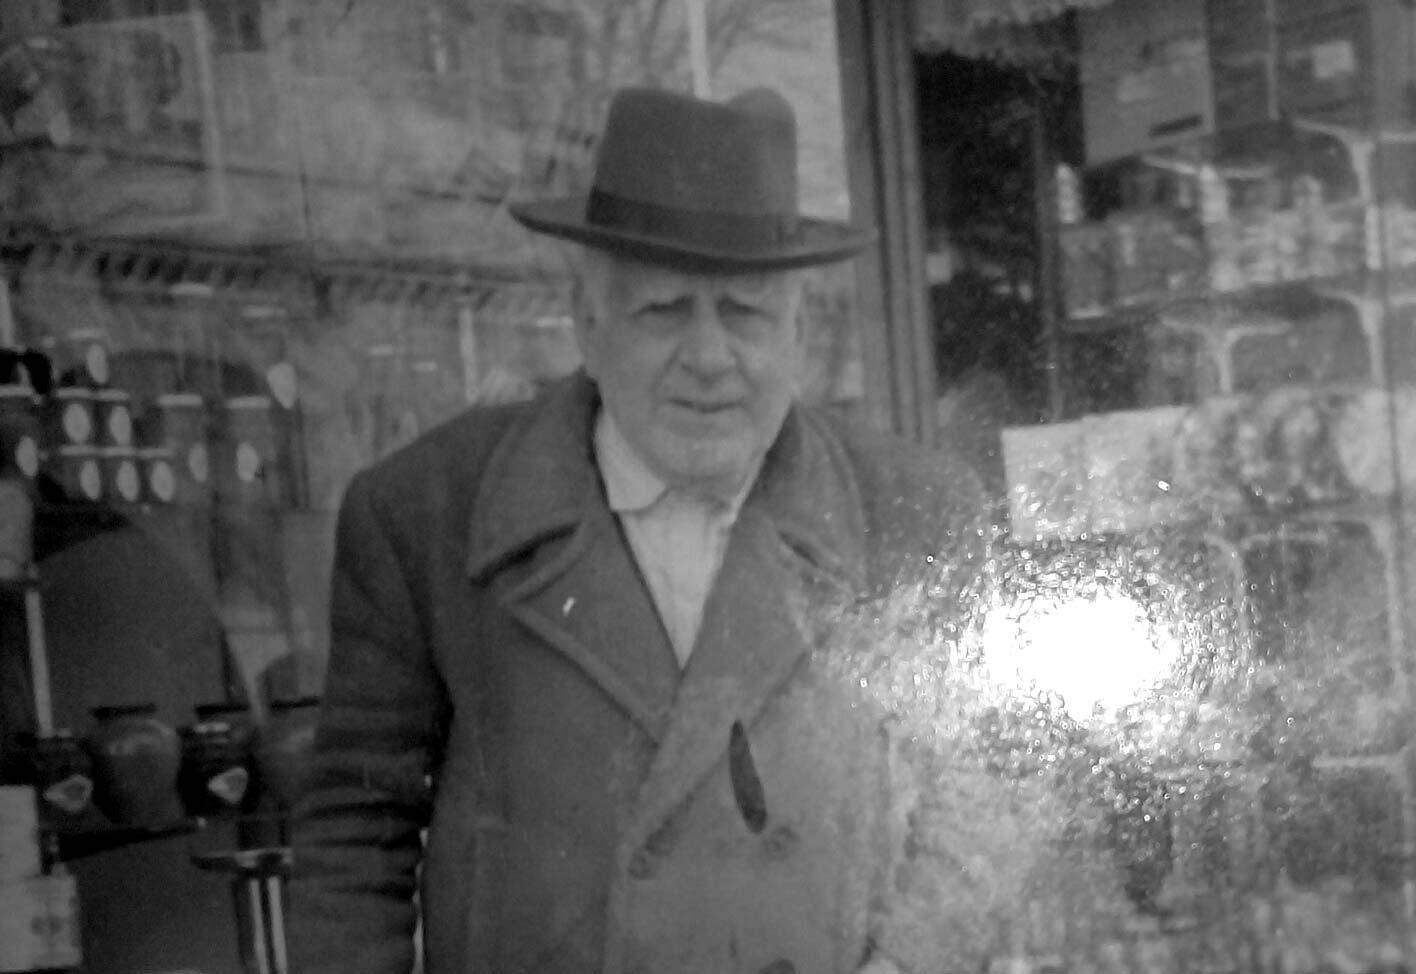 Antonio Cruz Marín